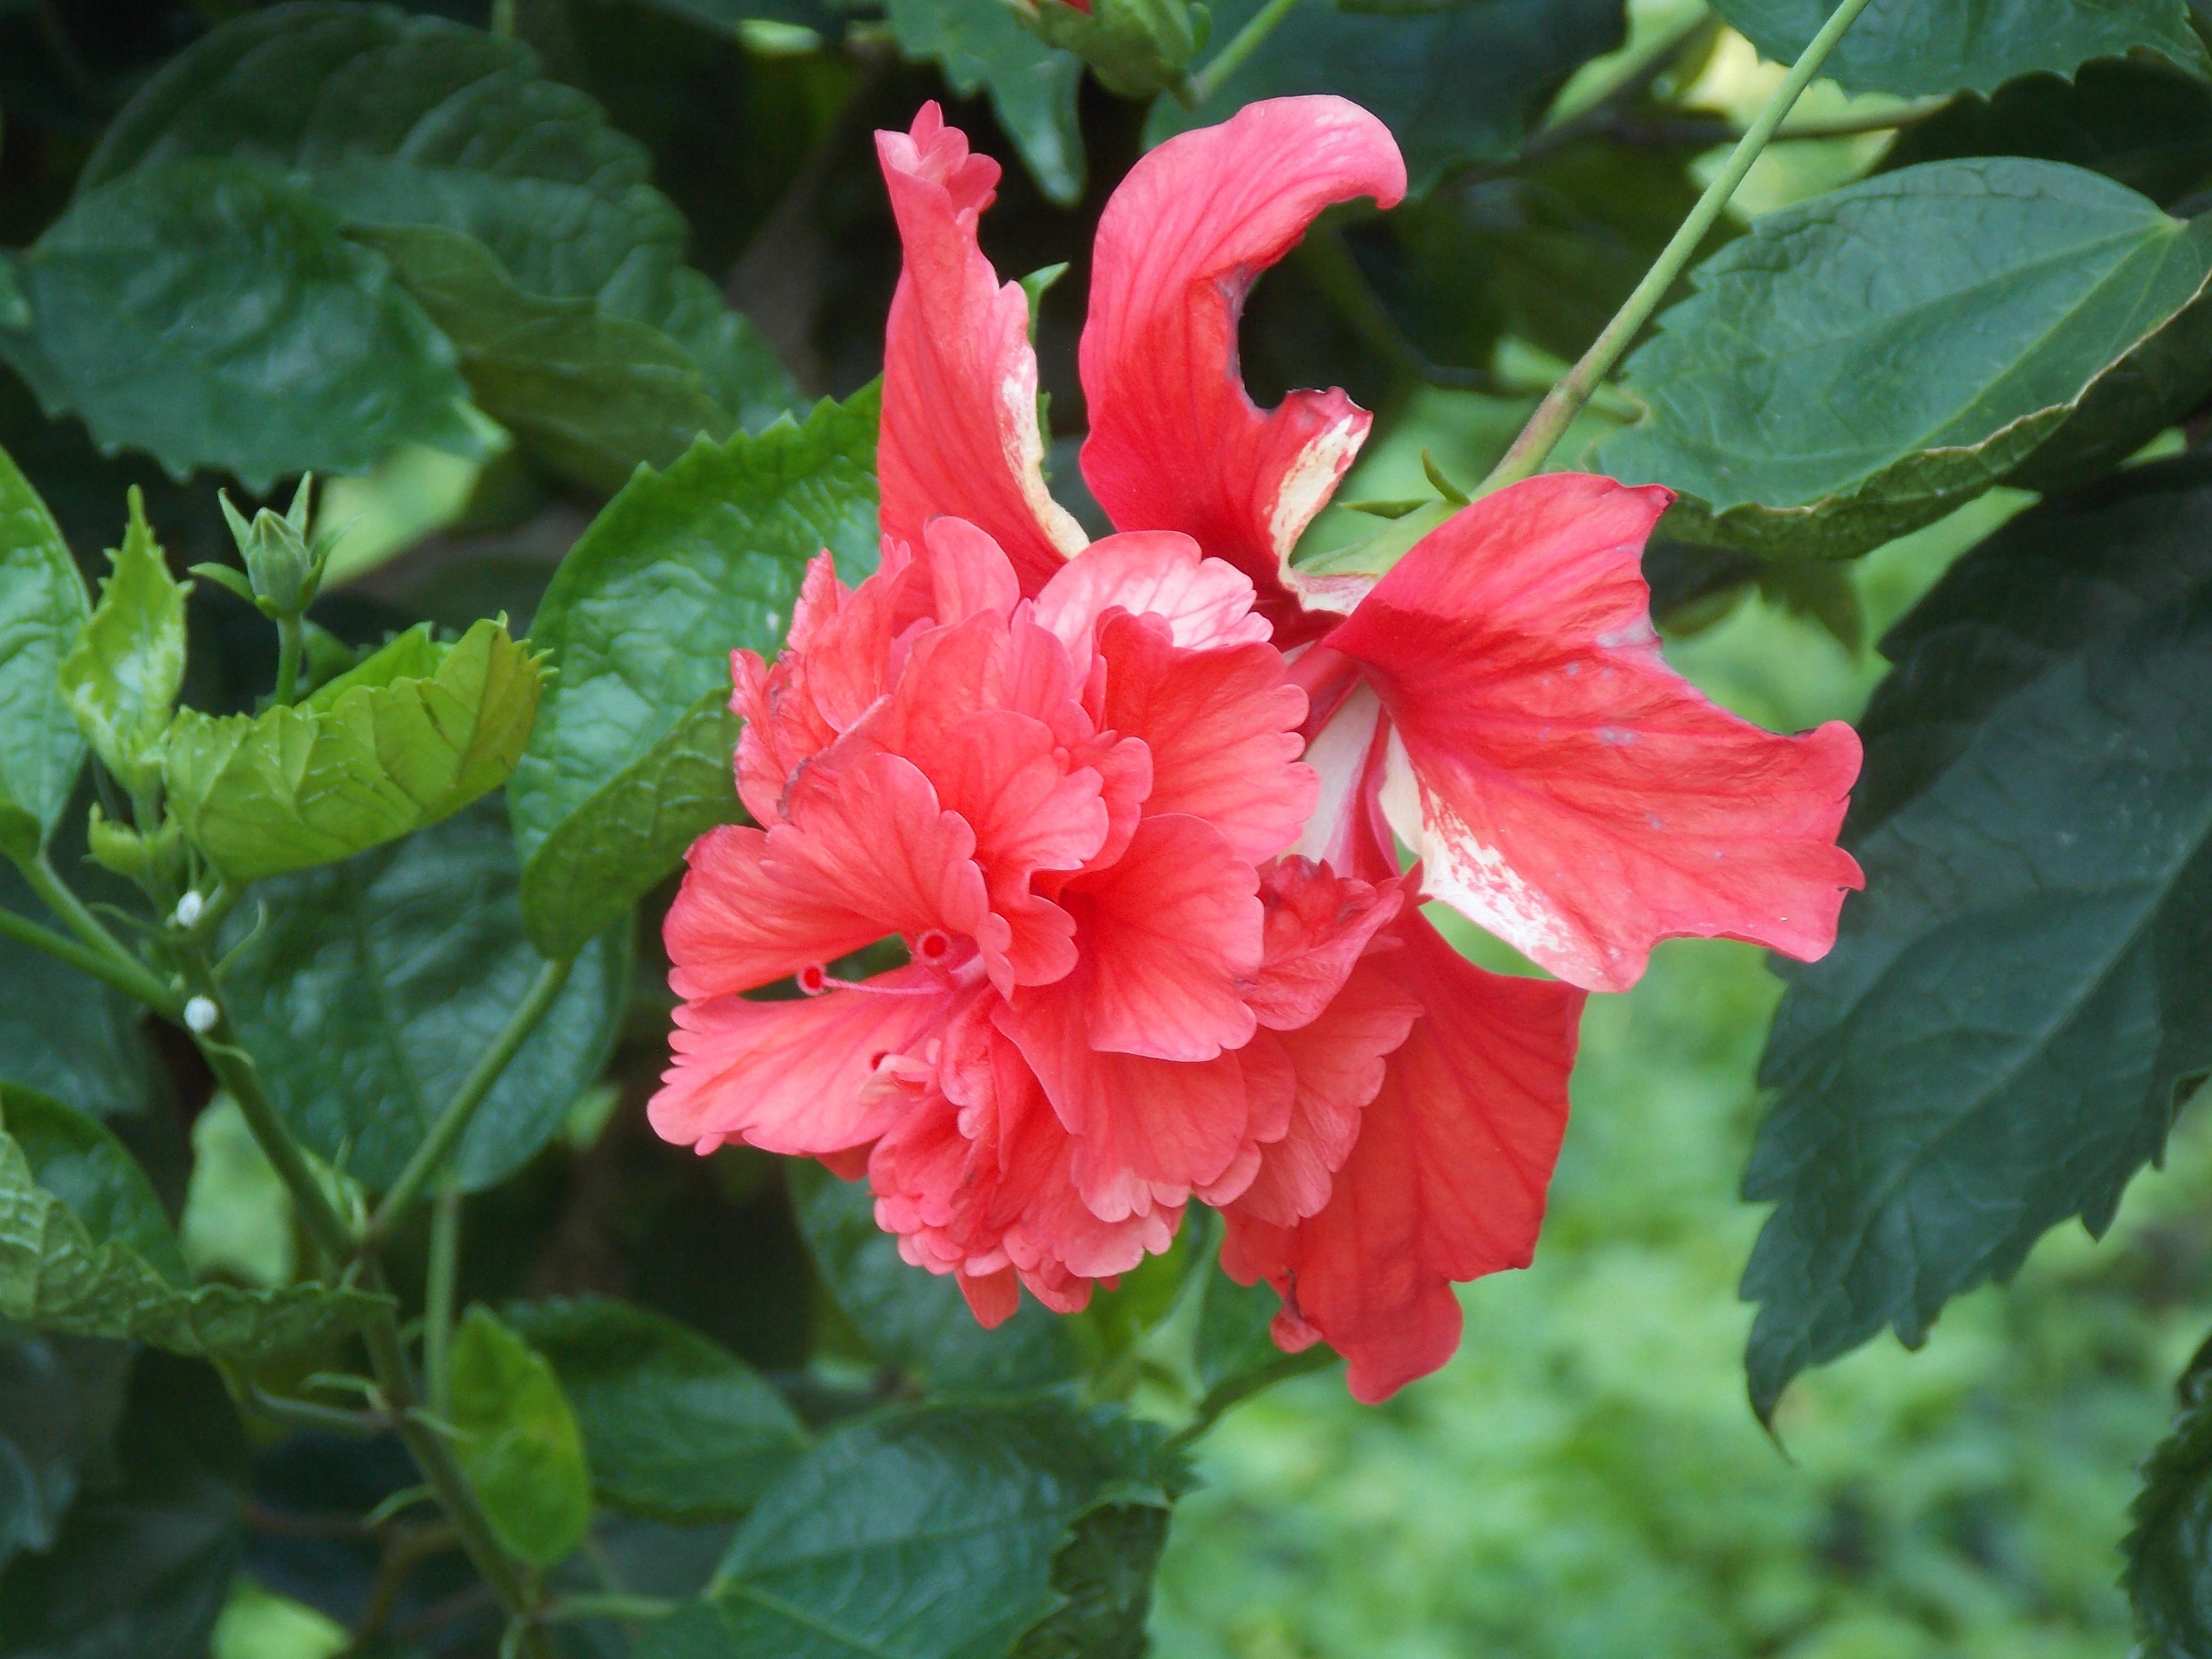 garden spa hibiscus garden ftempo. Black Bedroom Furniture Sets. Home Design Ideas